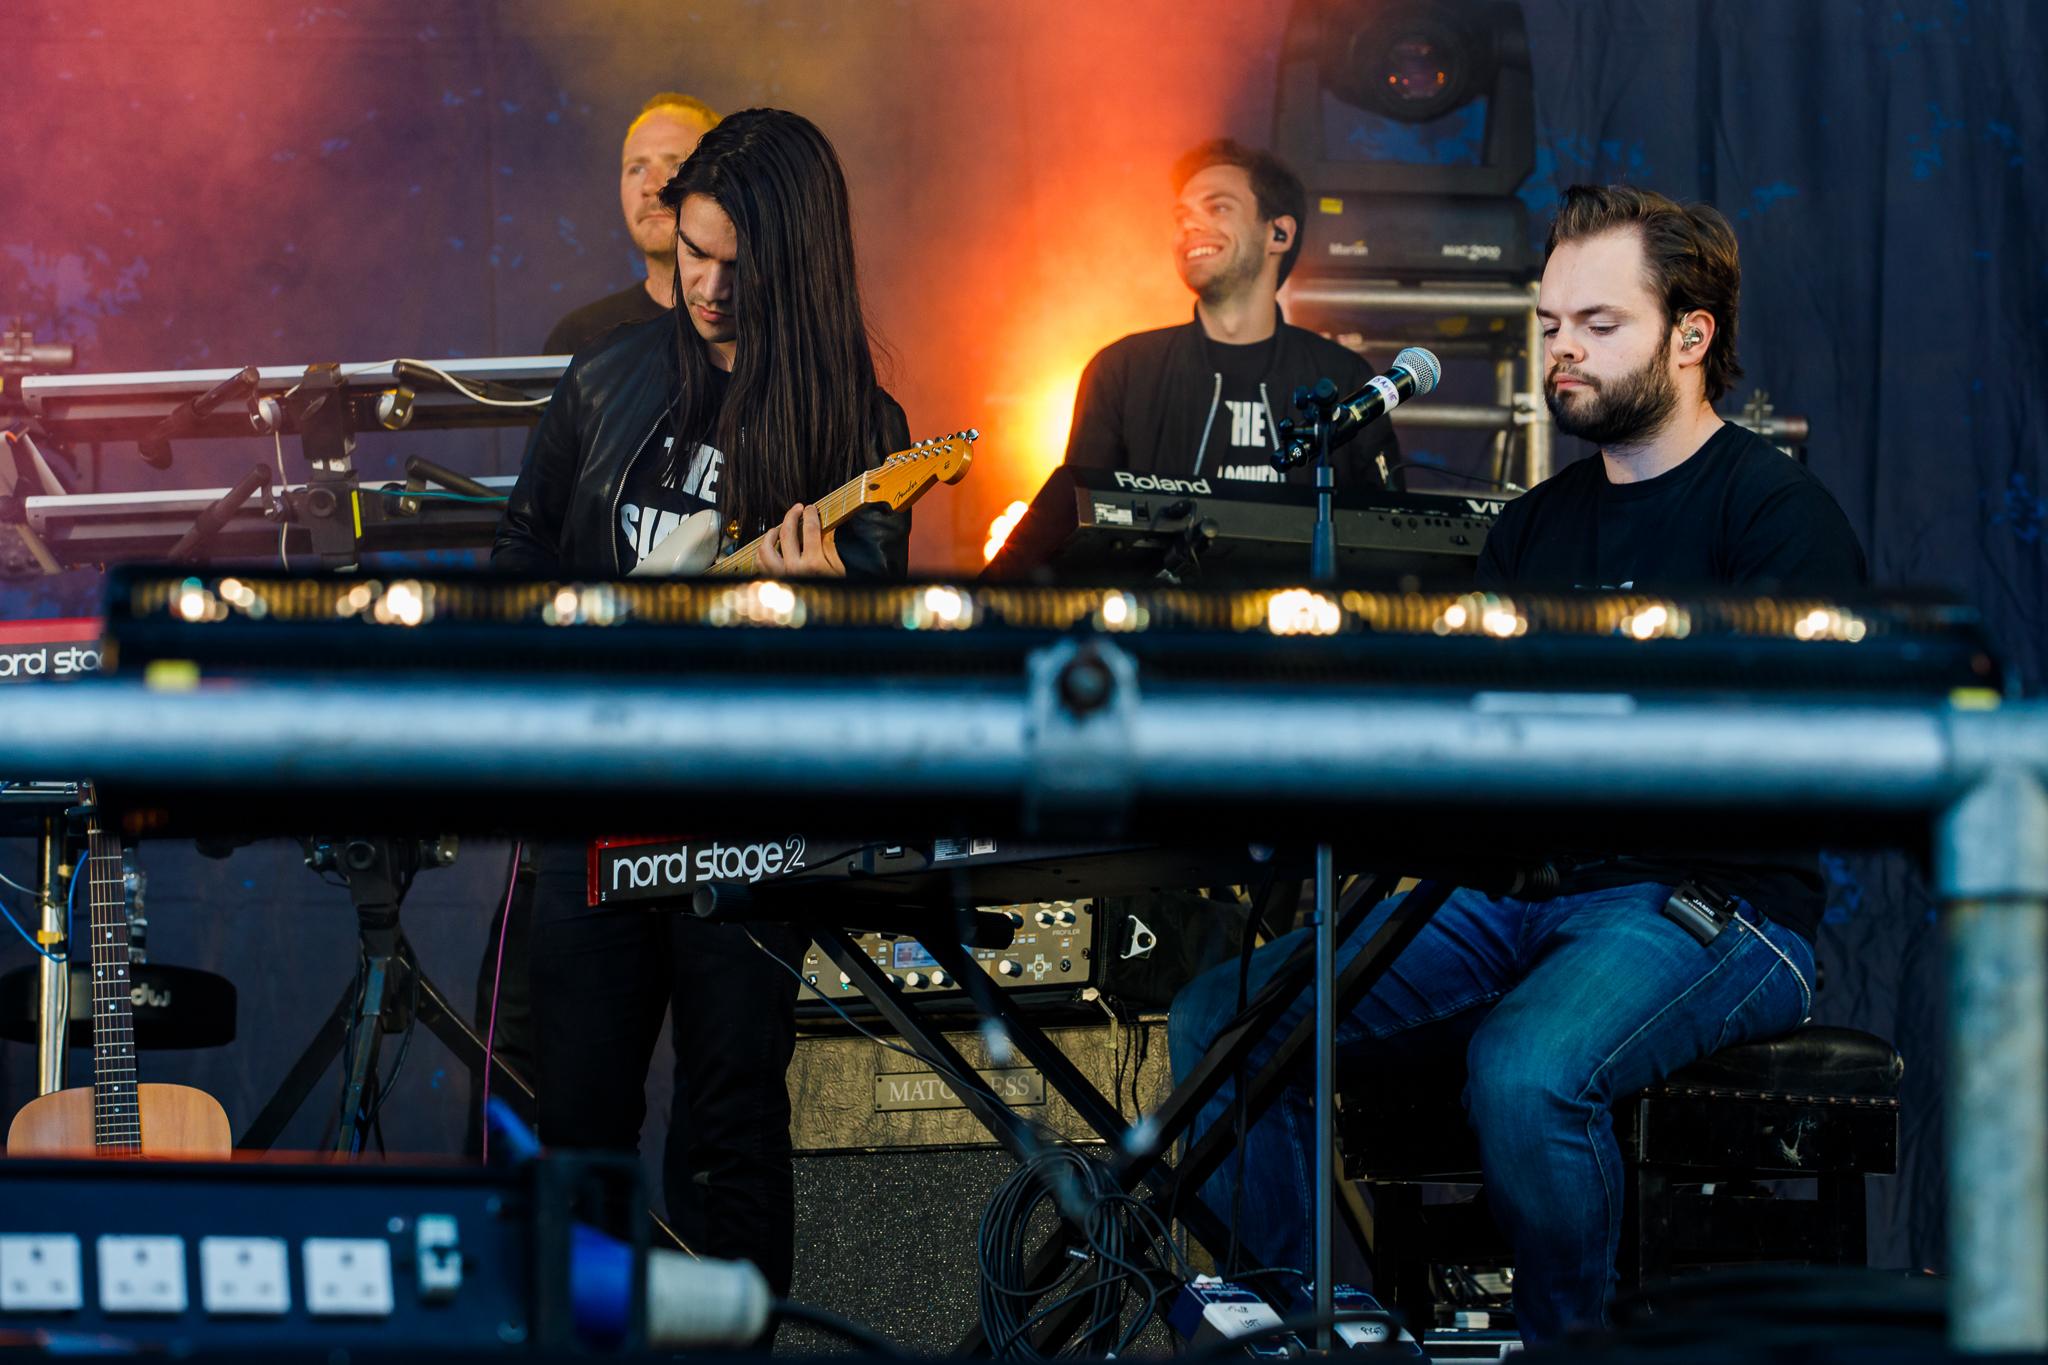 The Trevor Horn Band at Fairport's Cropredy Convention (photo by Matt Condon / @arcane93)